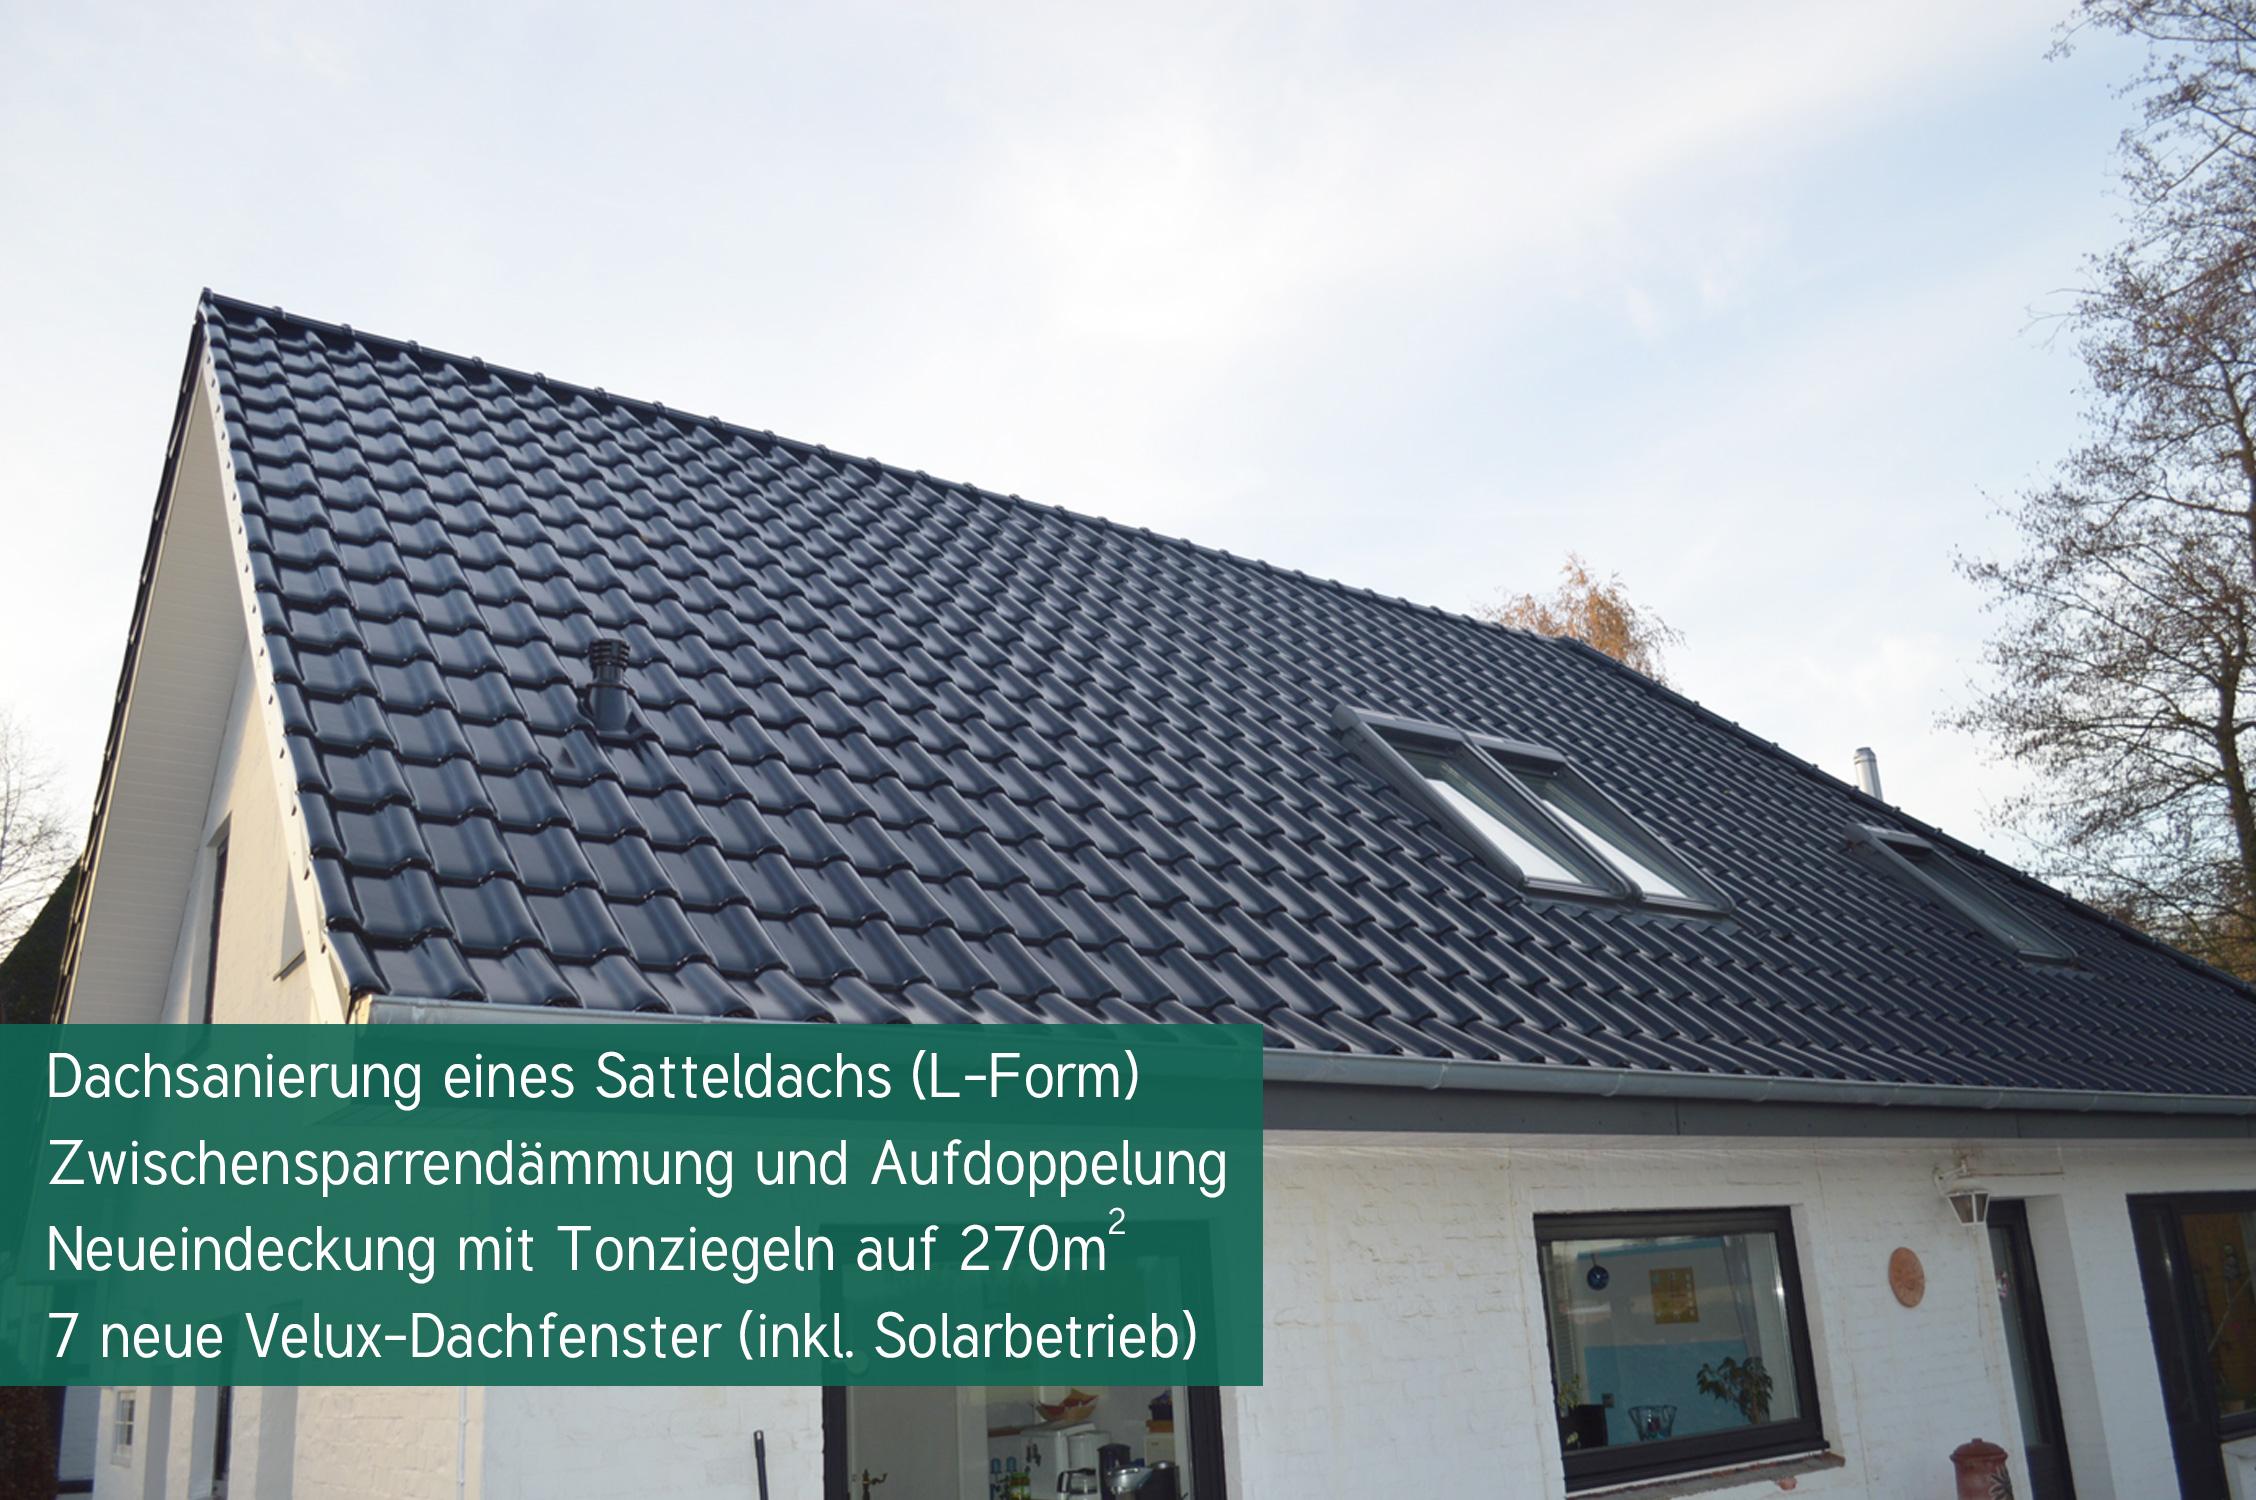 dachsanierung und gastherme in seevetal herr peter. Black Bedroom Furniture Sets. Home Design Ideas